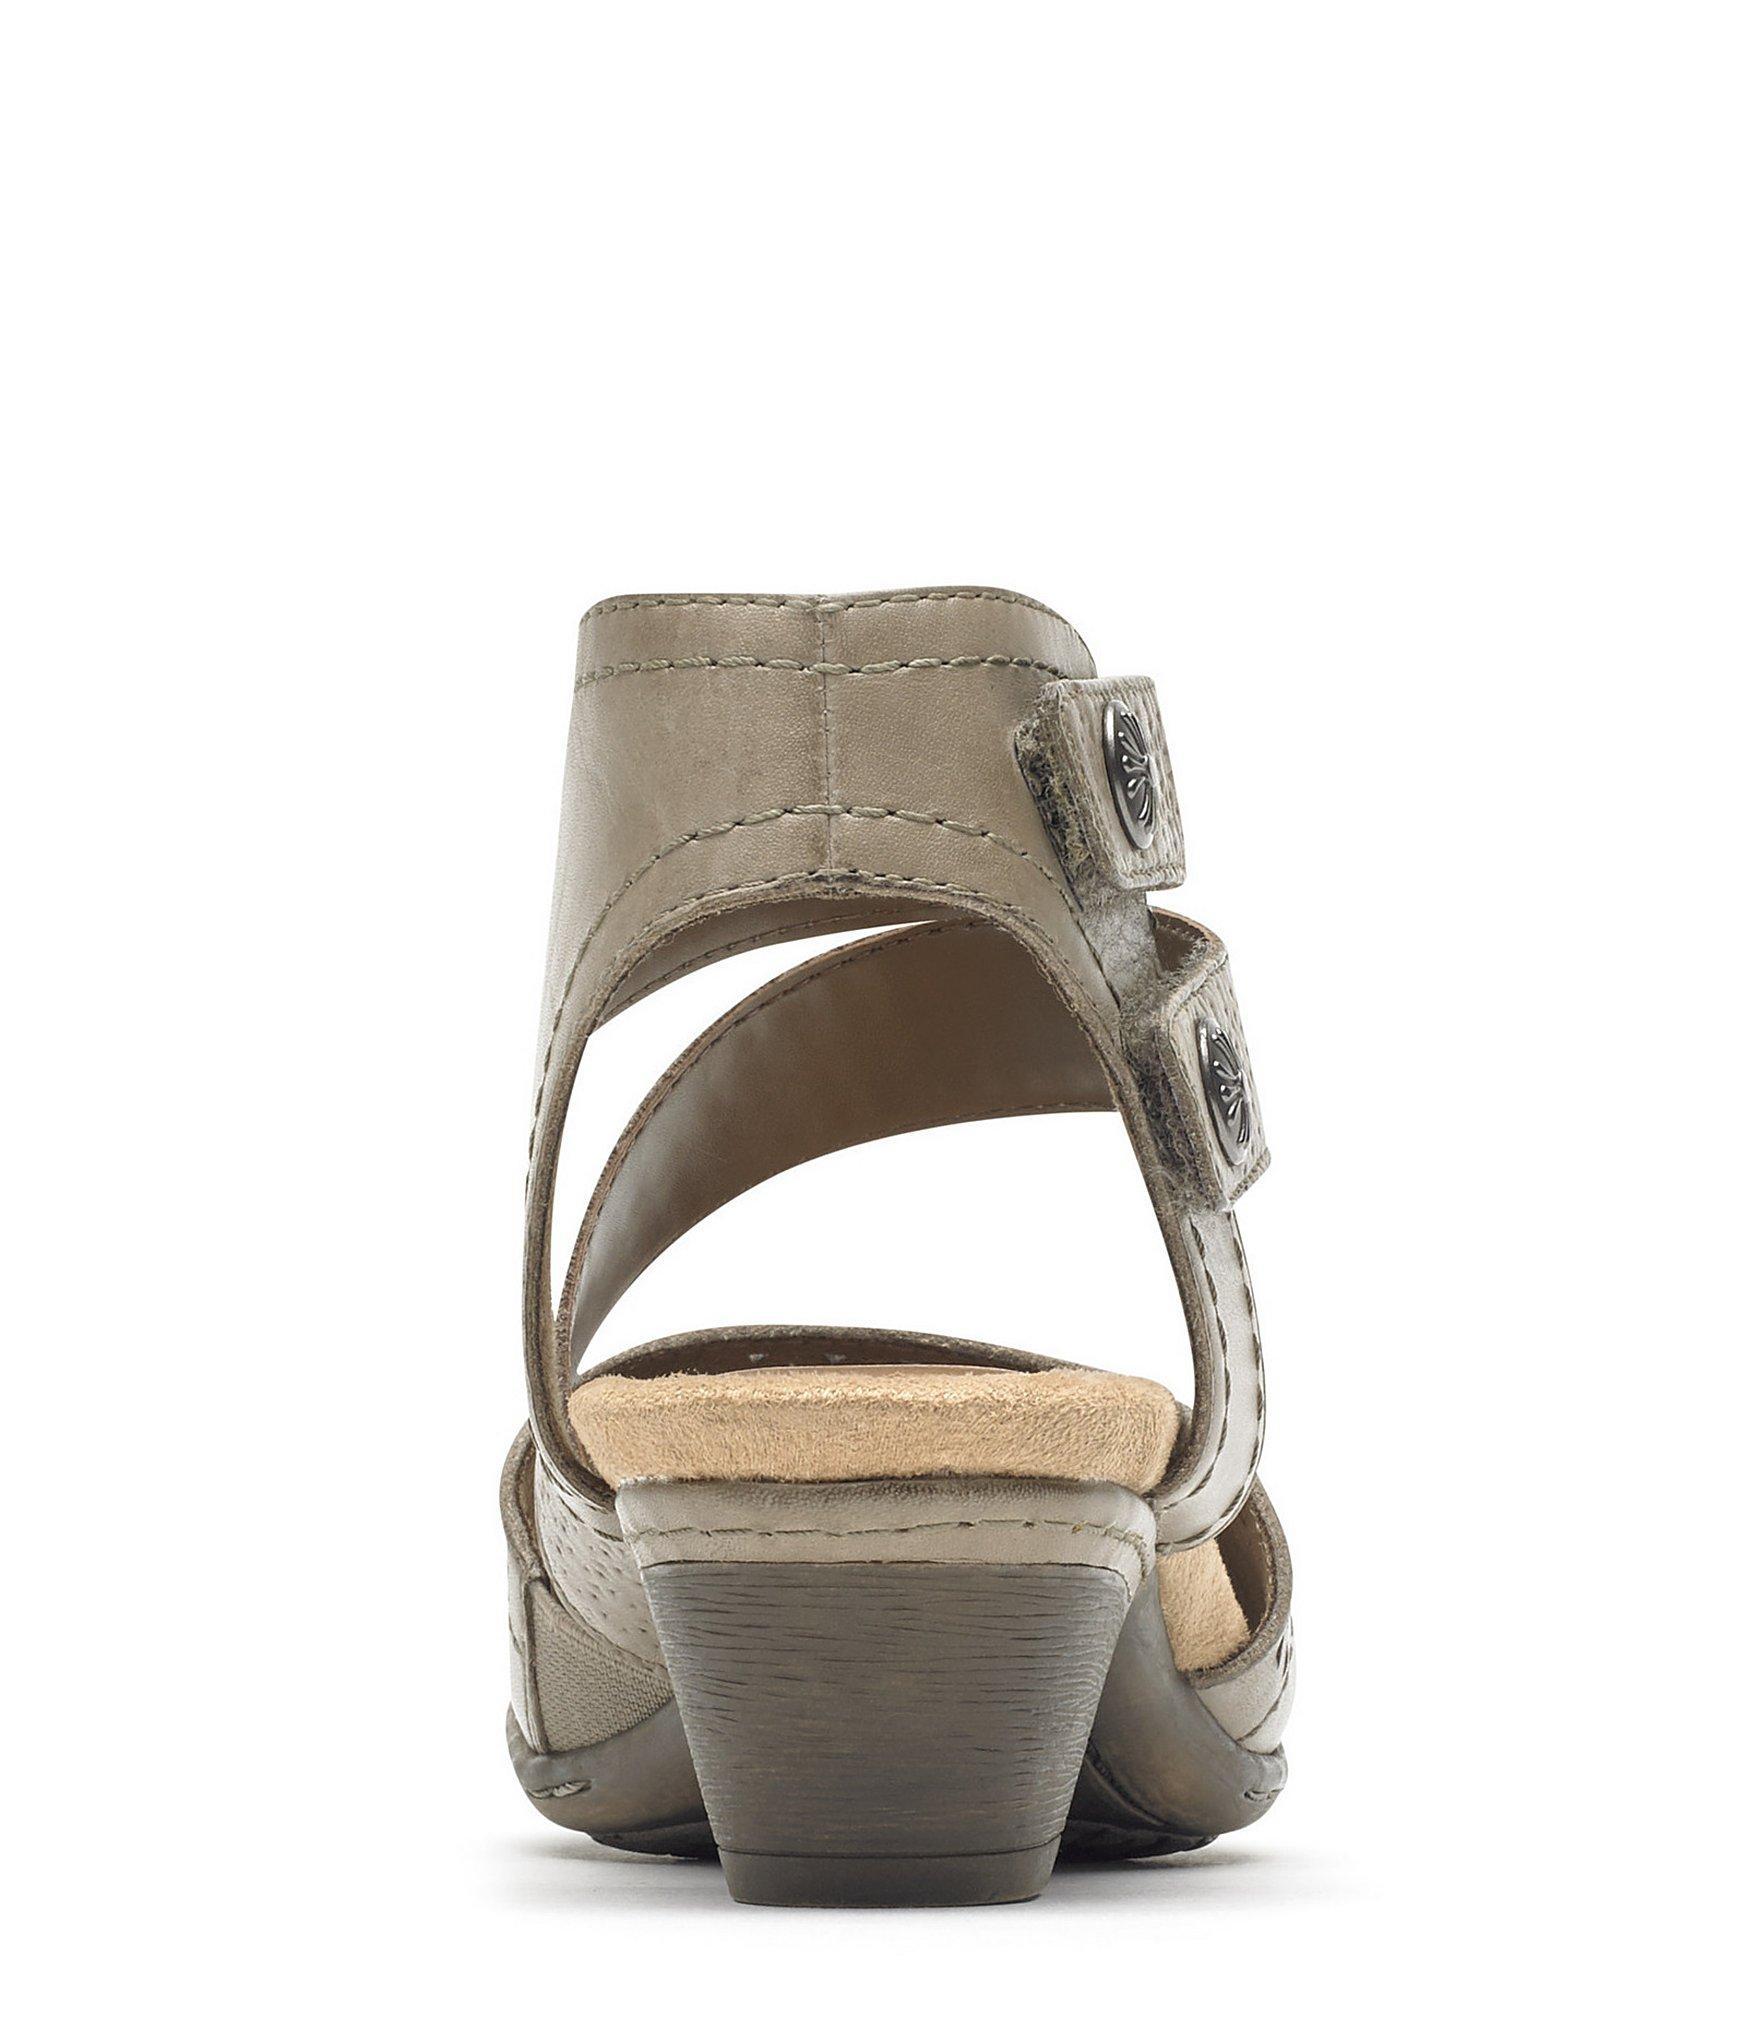 87b758909 Rockport - Multicolor Abbott Leather Cuff Block Heel Sandals - Lyst. View  fullscreen